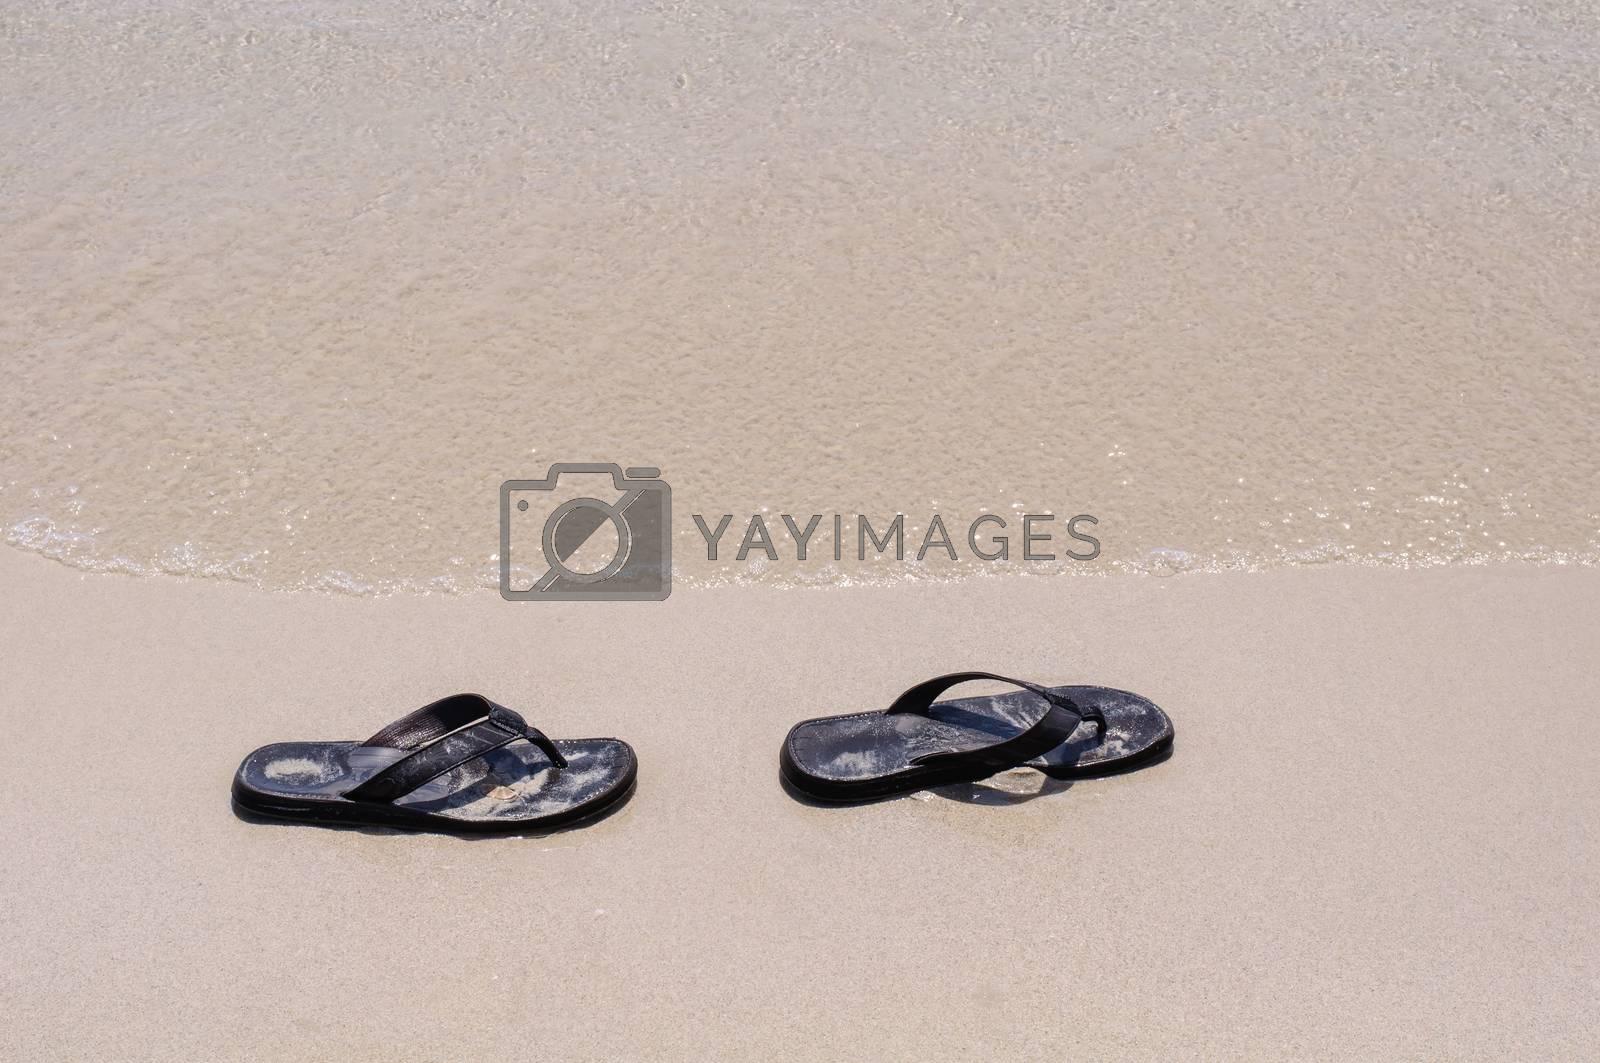 Royalty free image of Beach sandals on a sandy beach by Sorapop